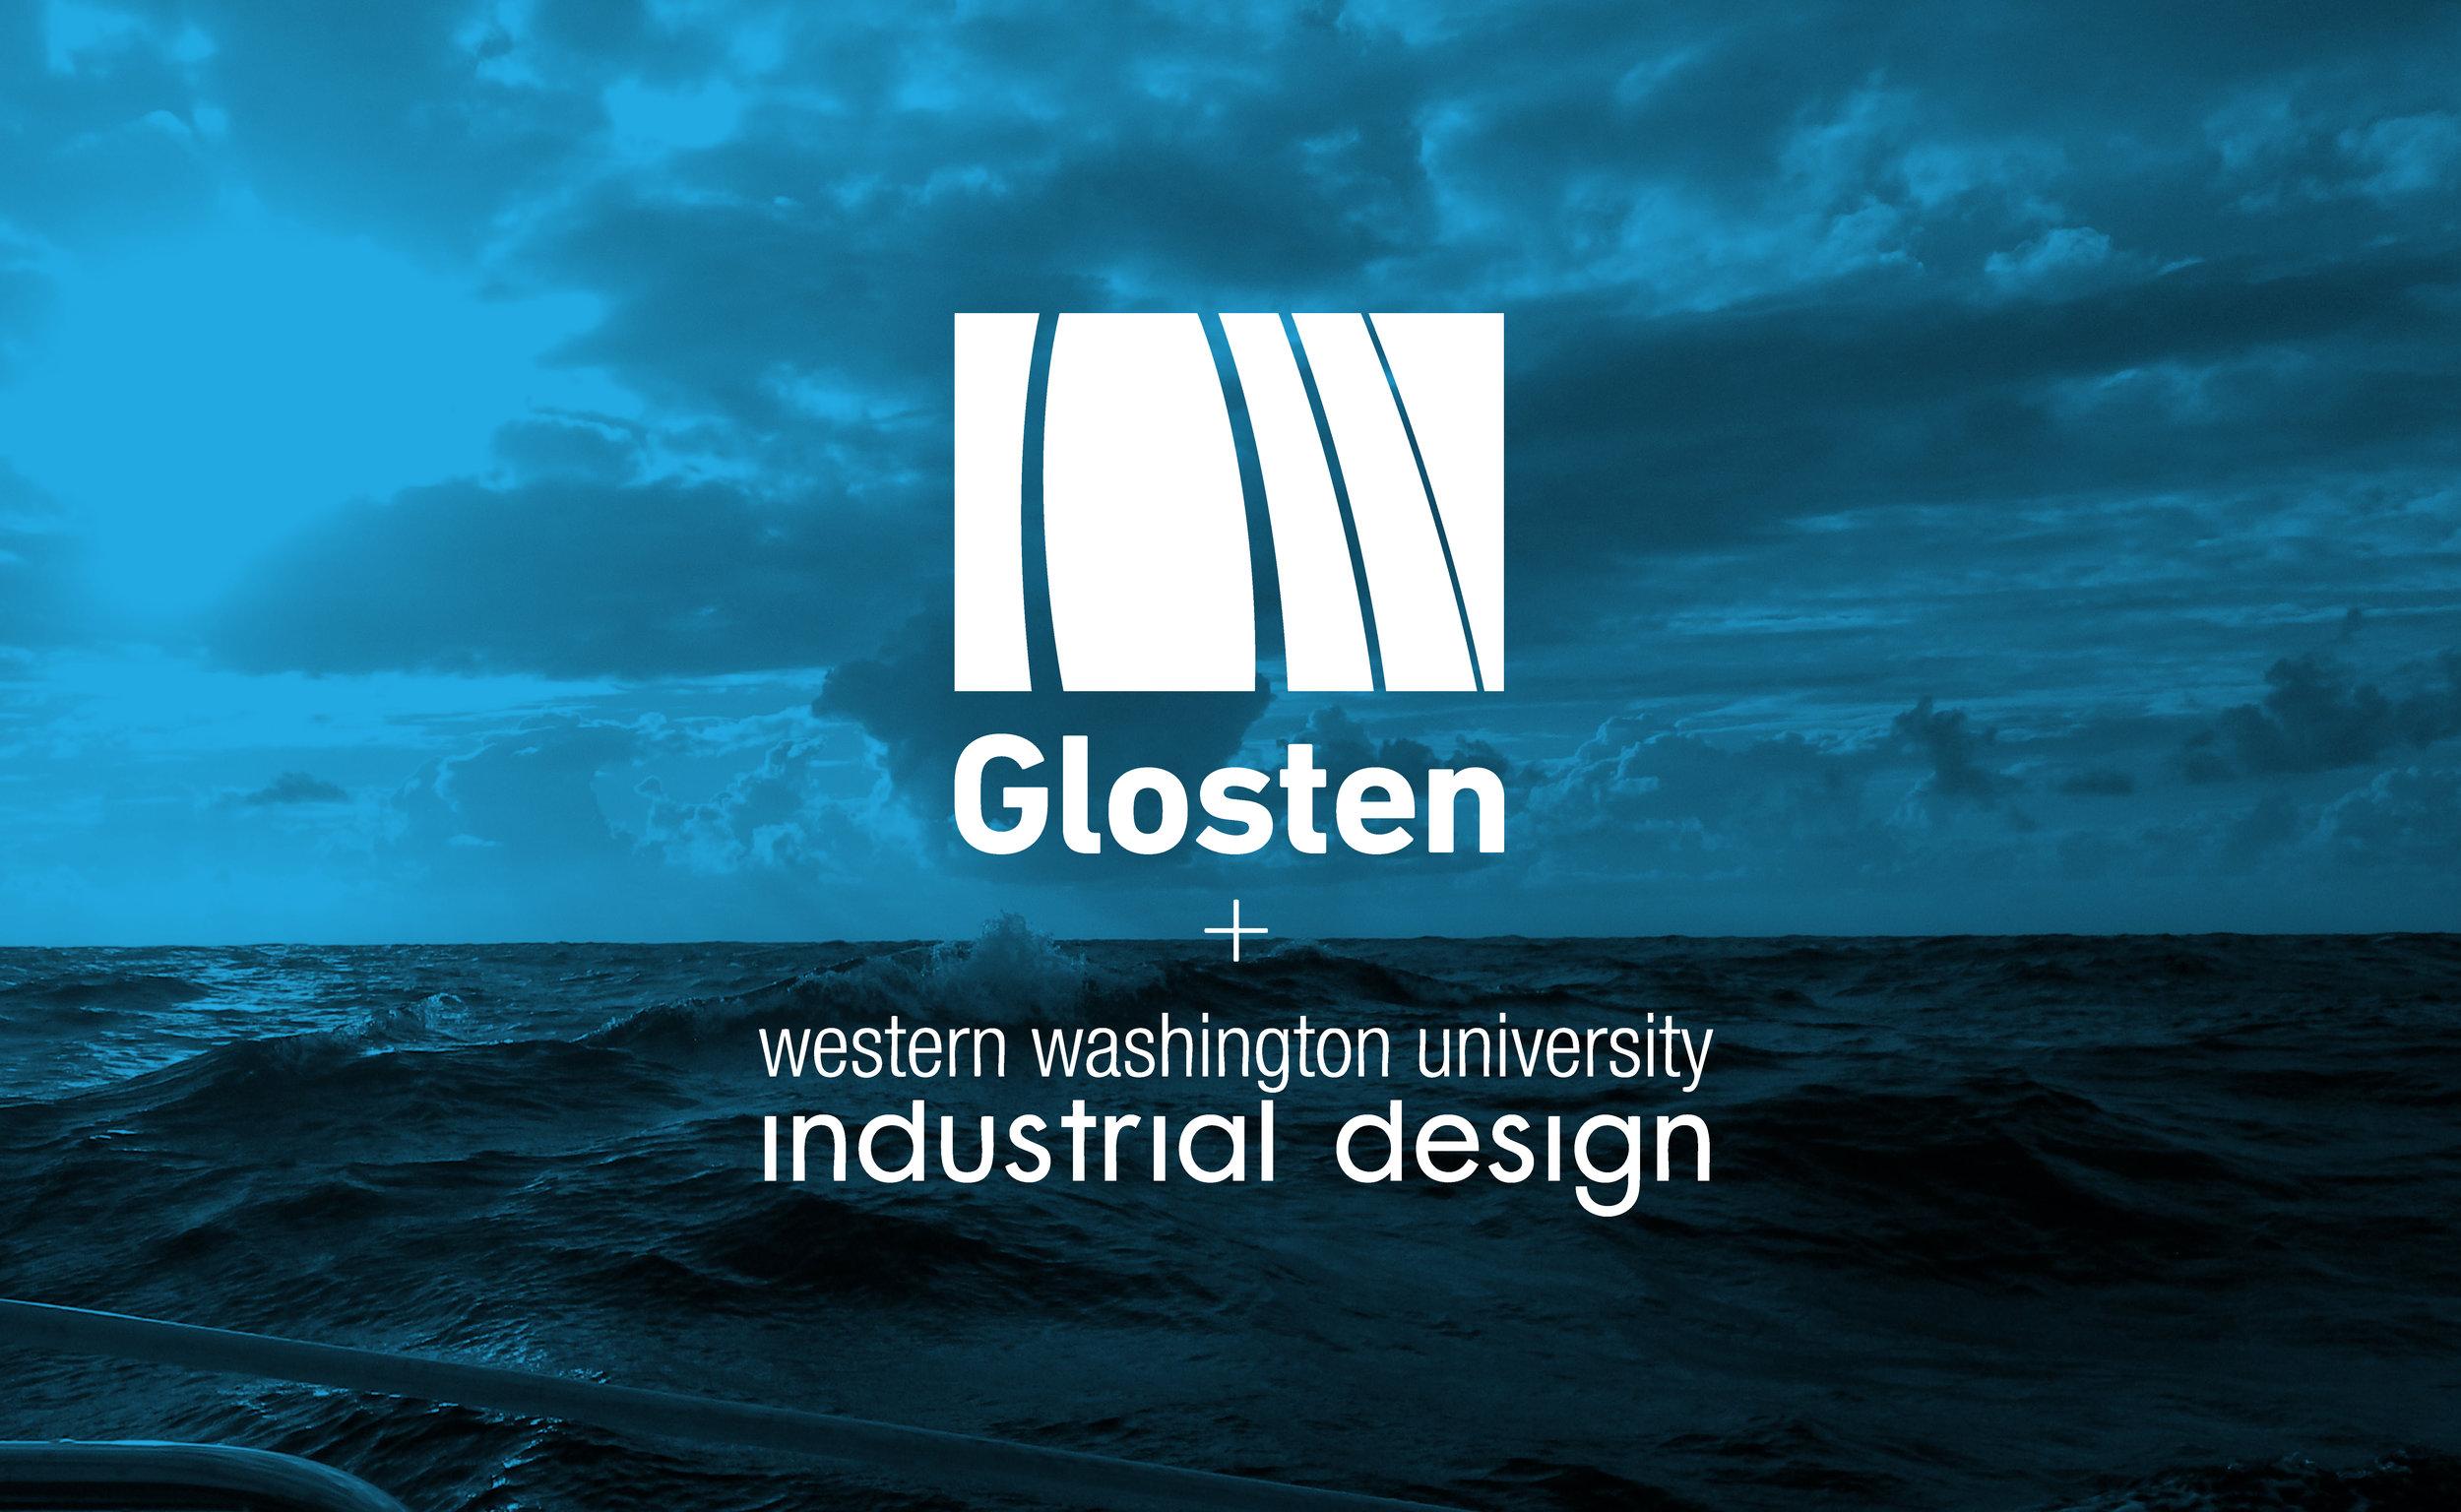 Final presentation gloston_Page_001.jpg